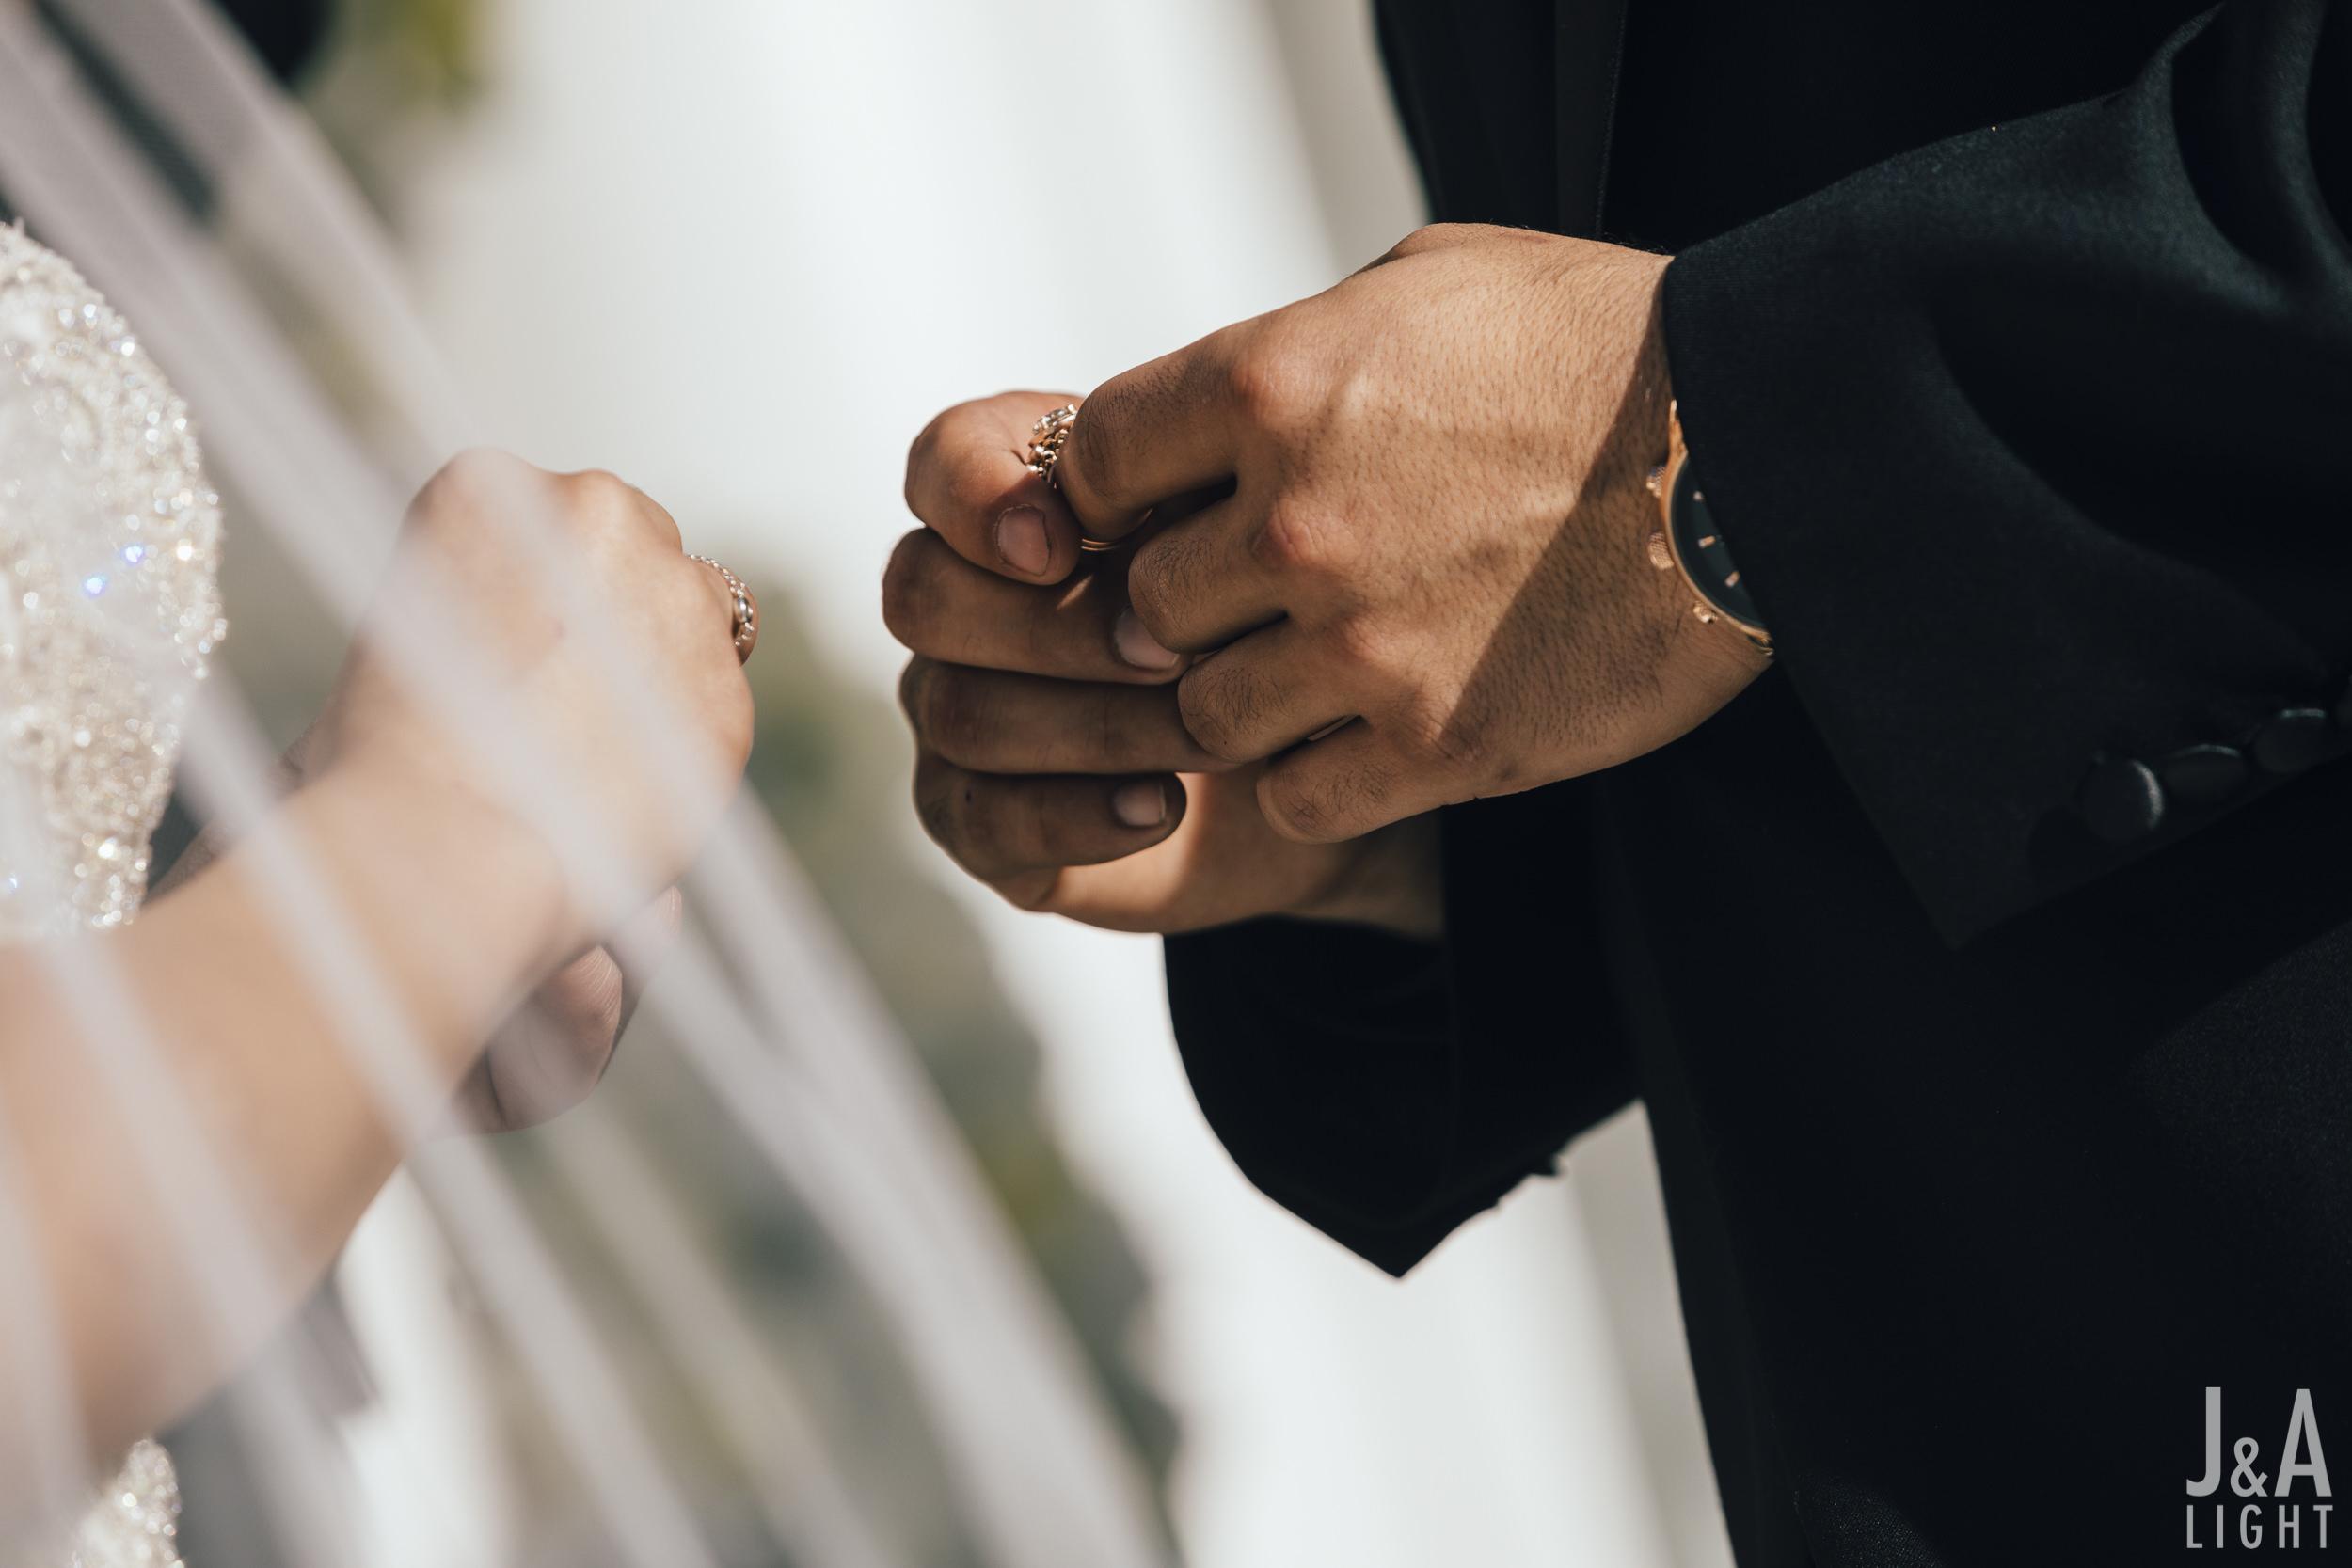 20171014-JanDan-LosBanos-GlassMansion-Wedding-Blog-040.jpg